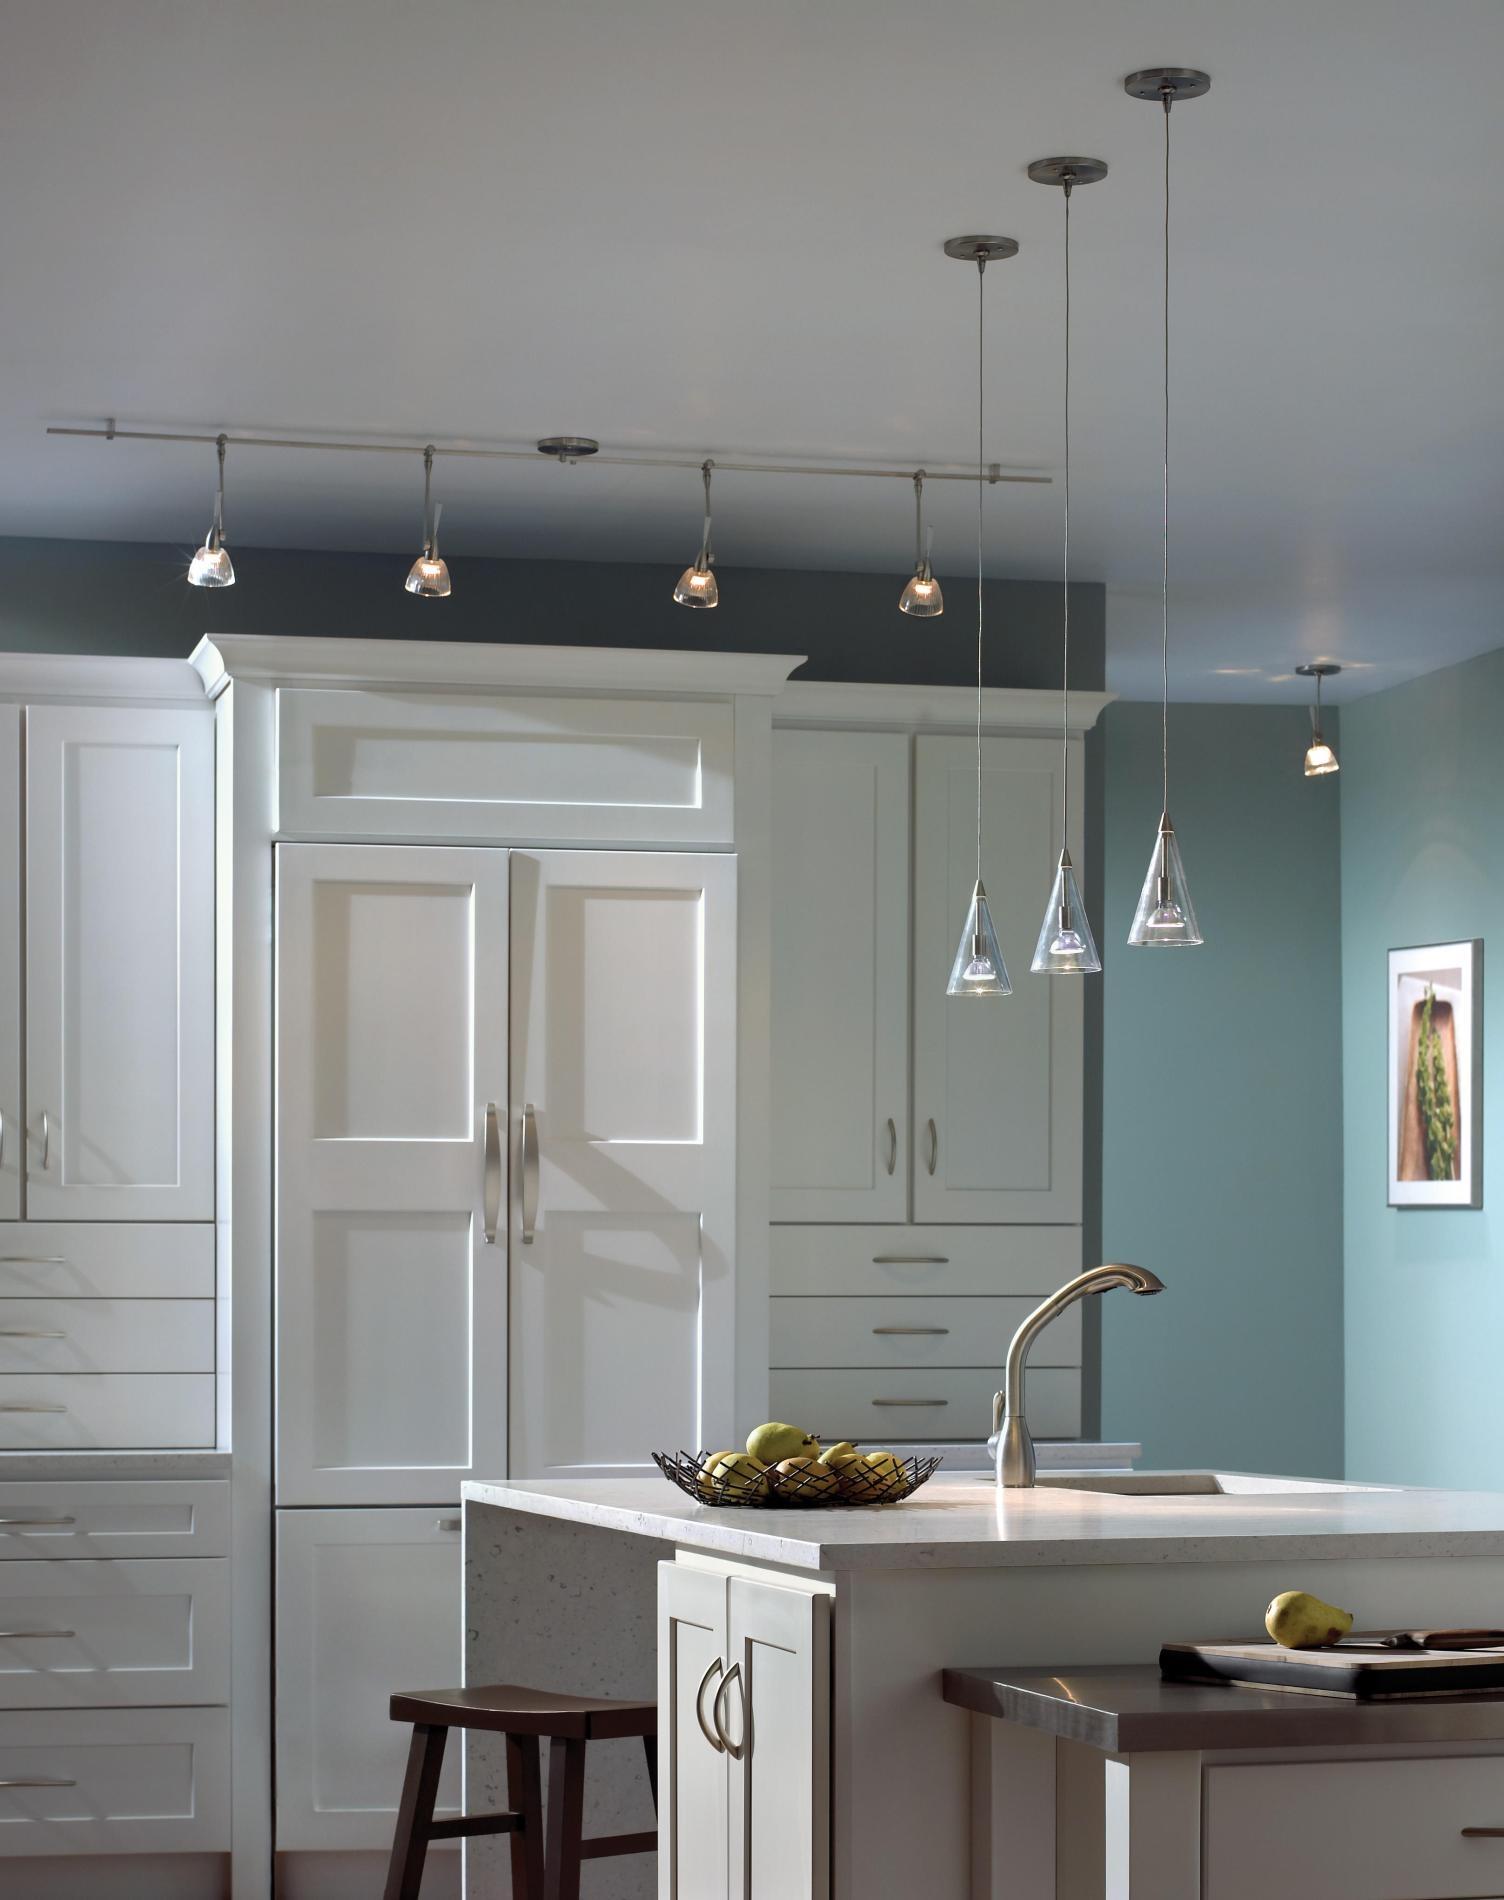 Best Kitchen Lighting For High Ceilings